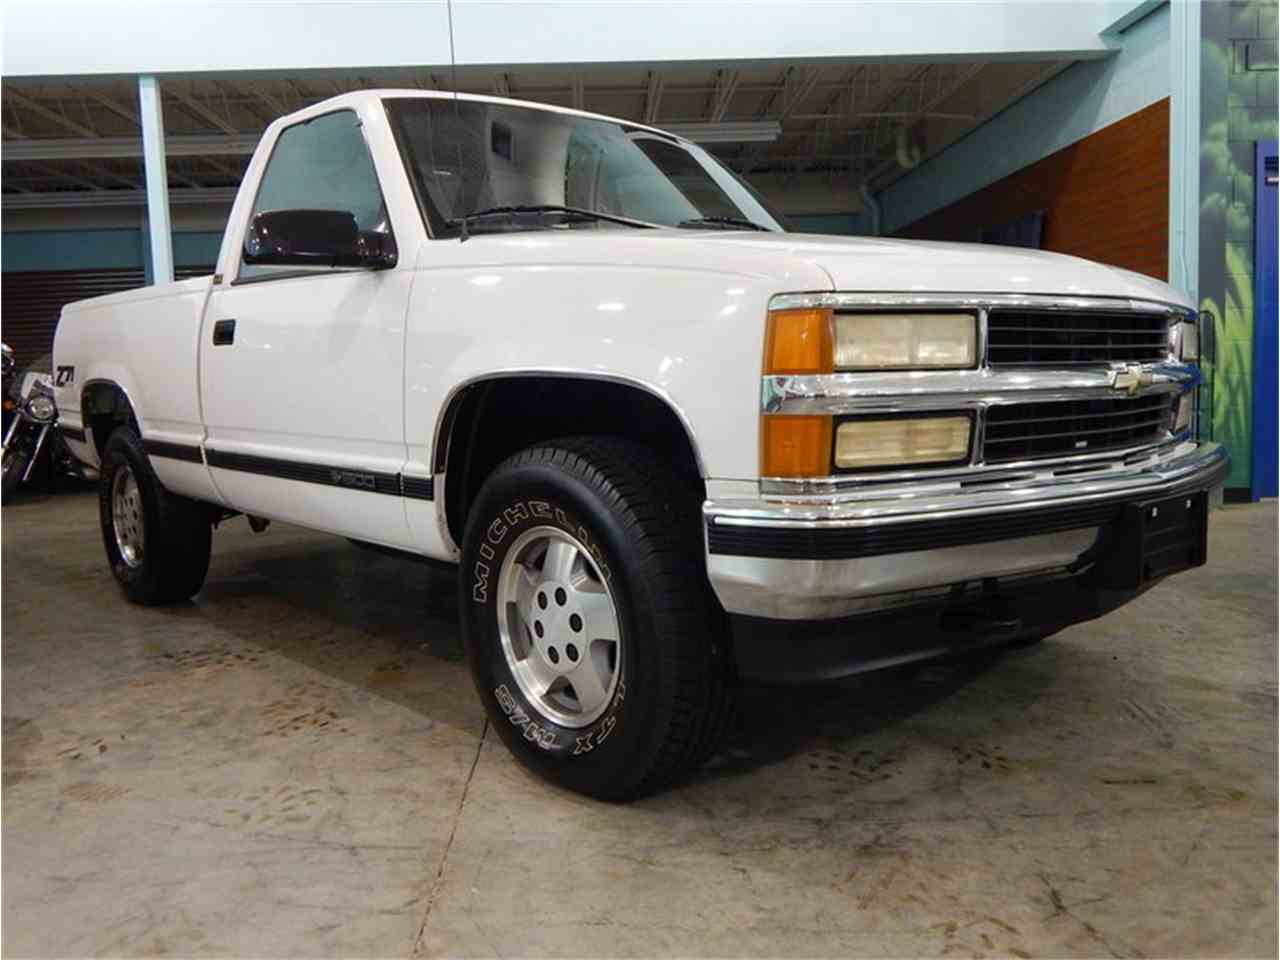 Silverado 95 chevy silverado : 1995 Chevrolet Silverado for Sale | ClassicCars.com | CC-1024761